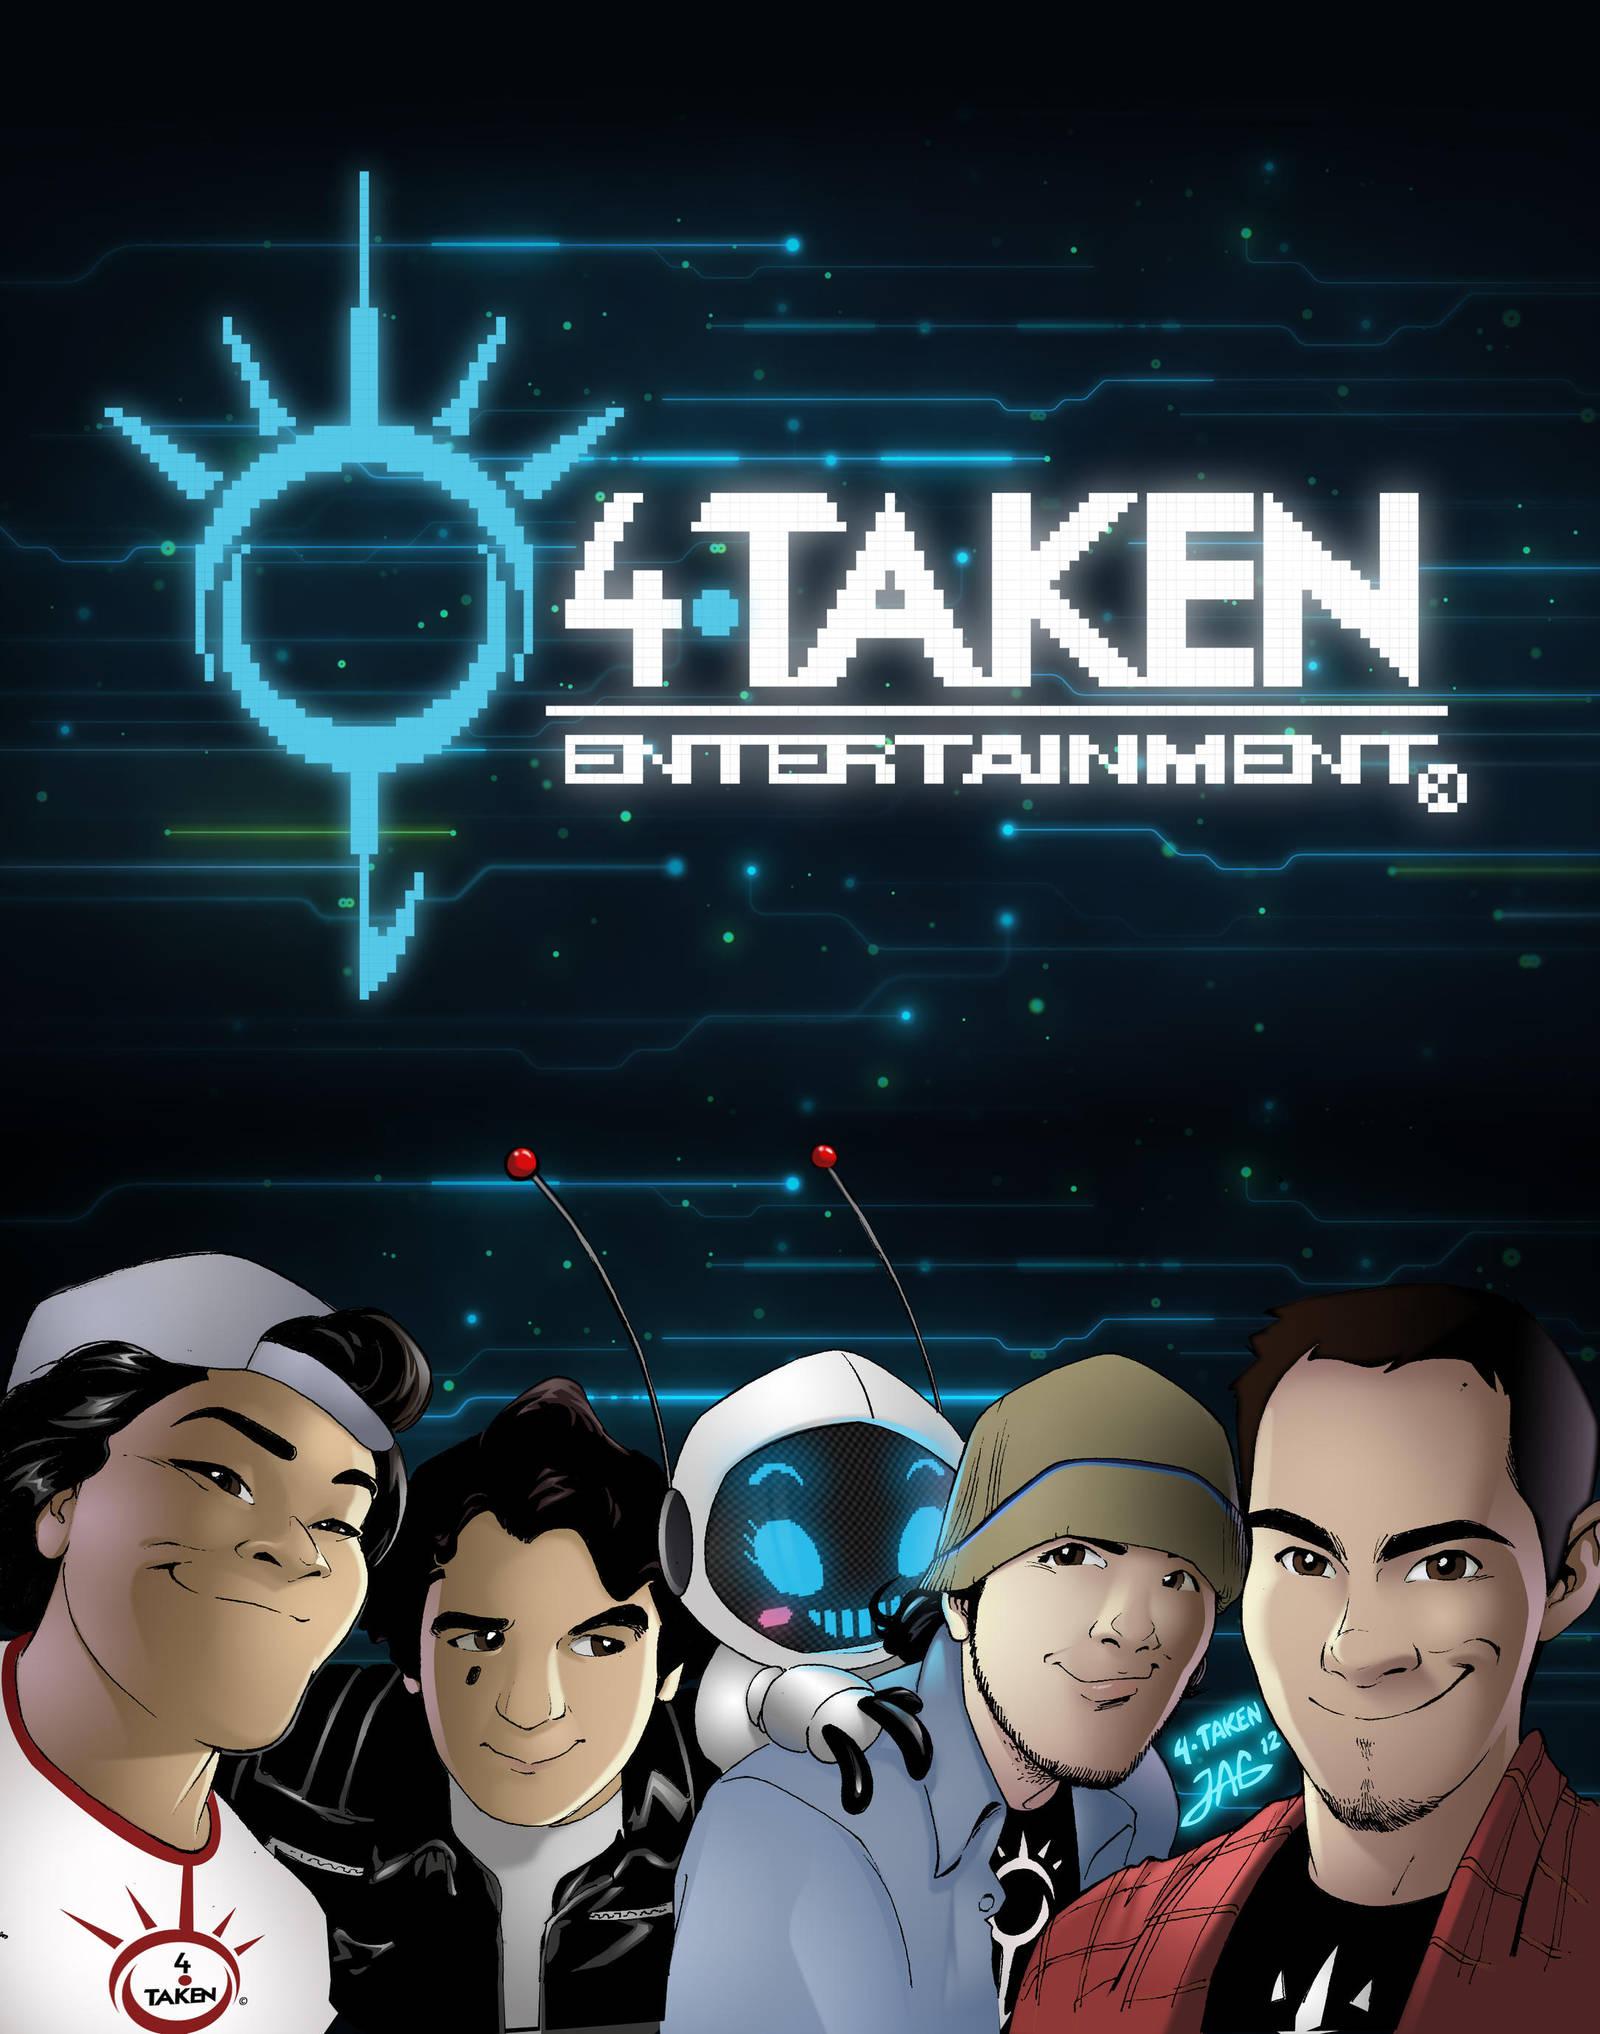 4TAKEN - First ID by Team4Taken